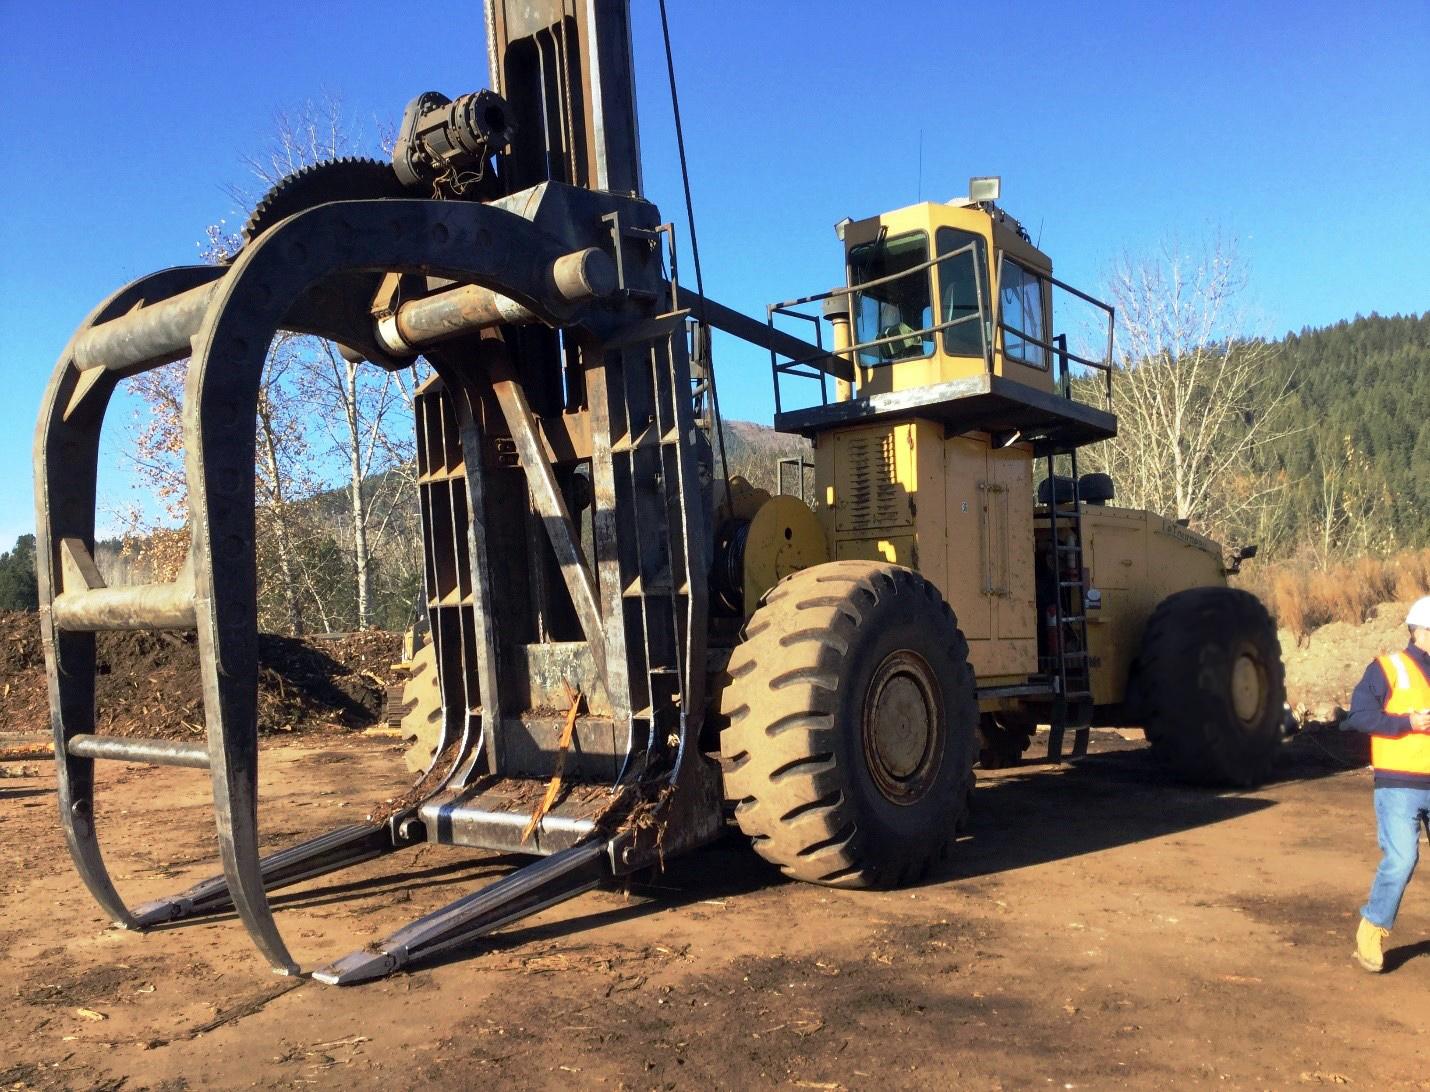 Titan Touts Ply Ratings of OTR Tires